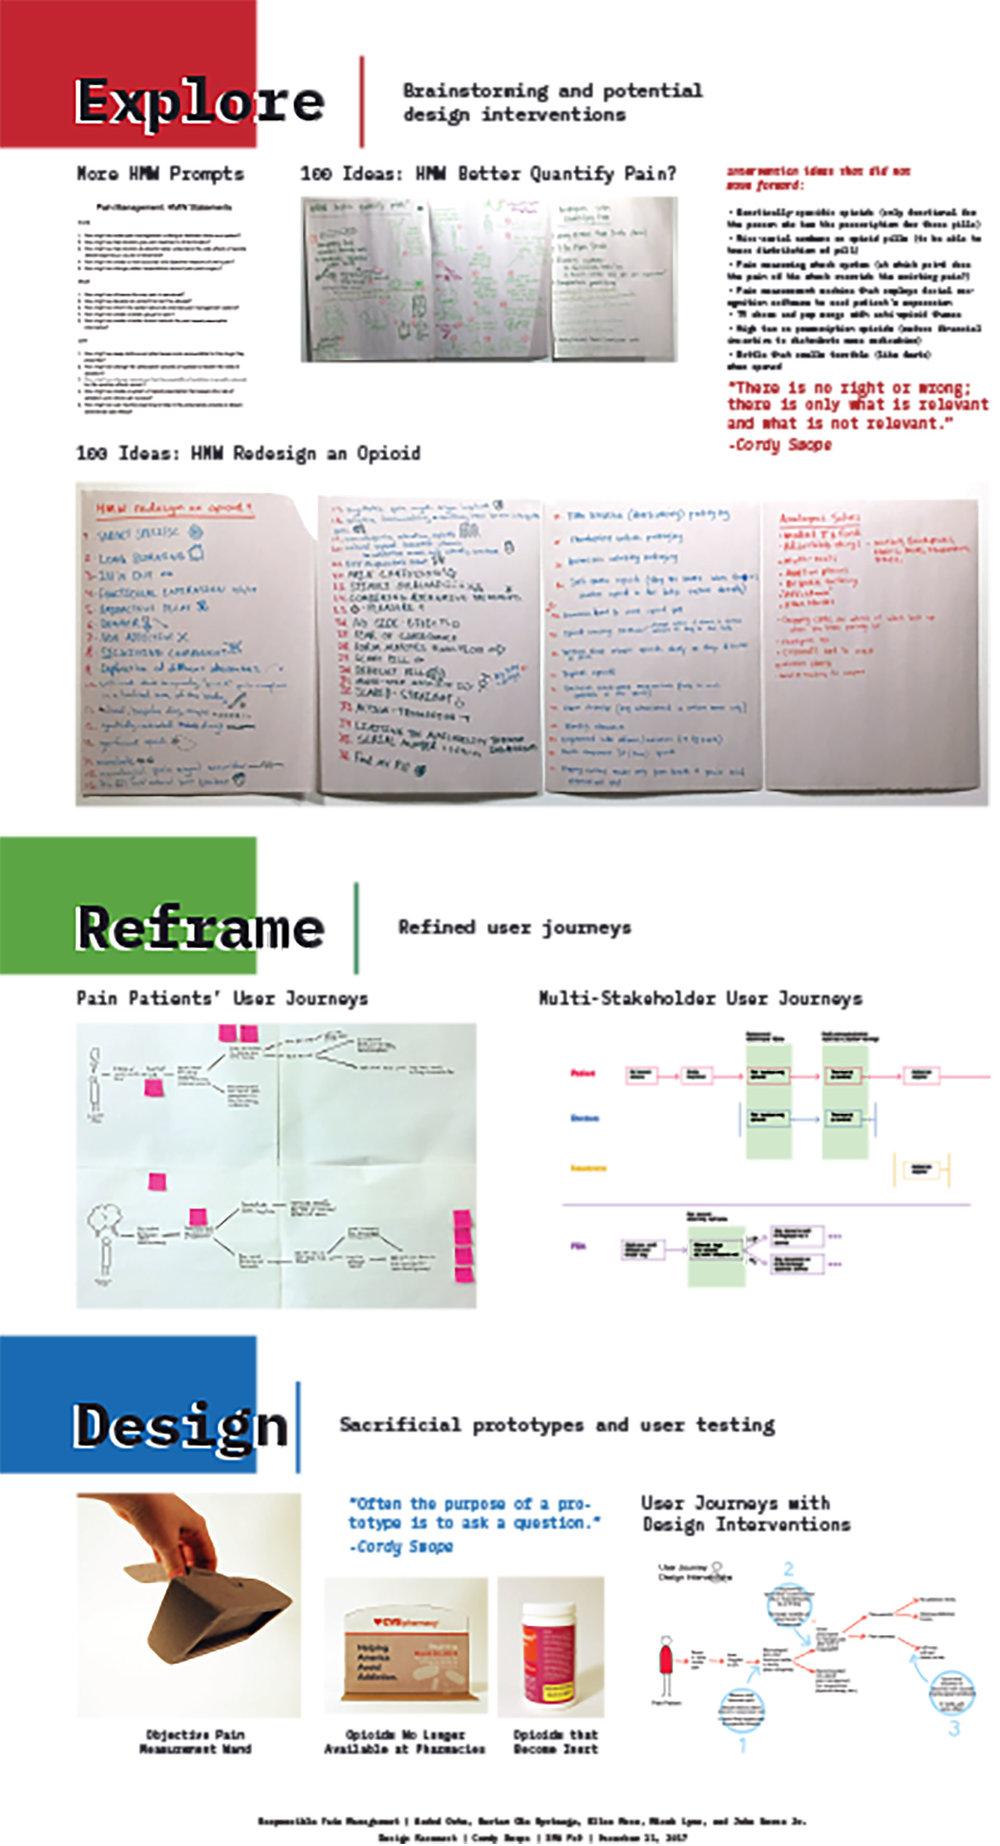 final-posters-02_Pain-Management_Design-Integration_11-Dec-17.jpg